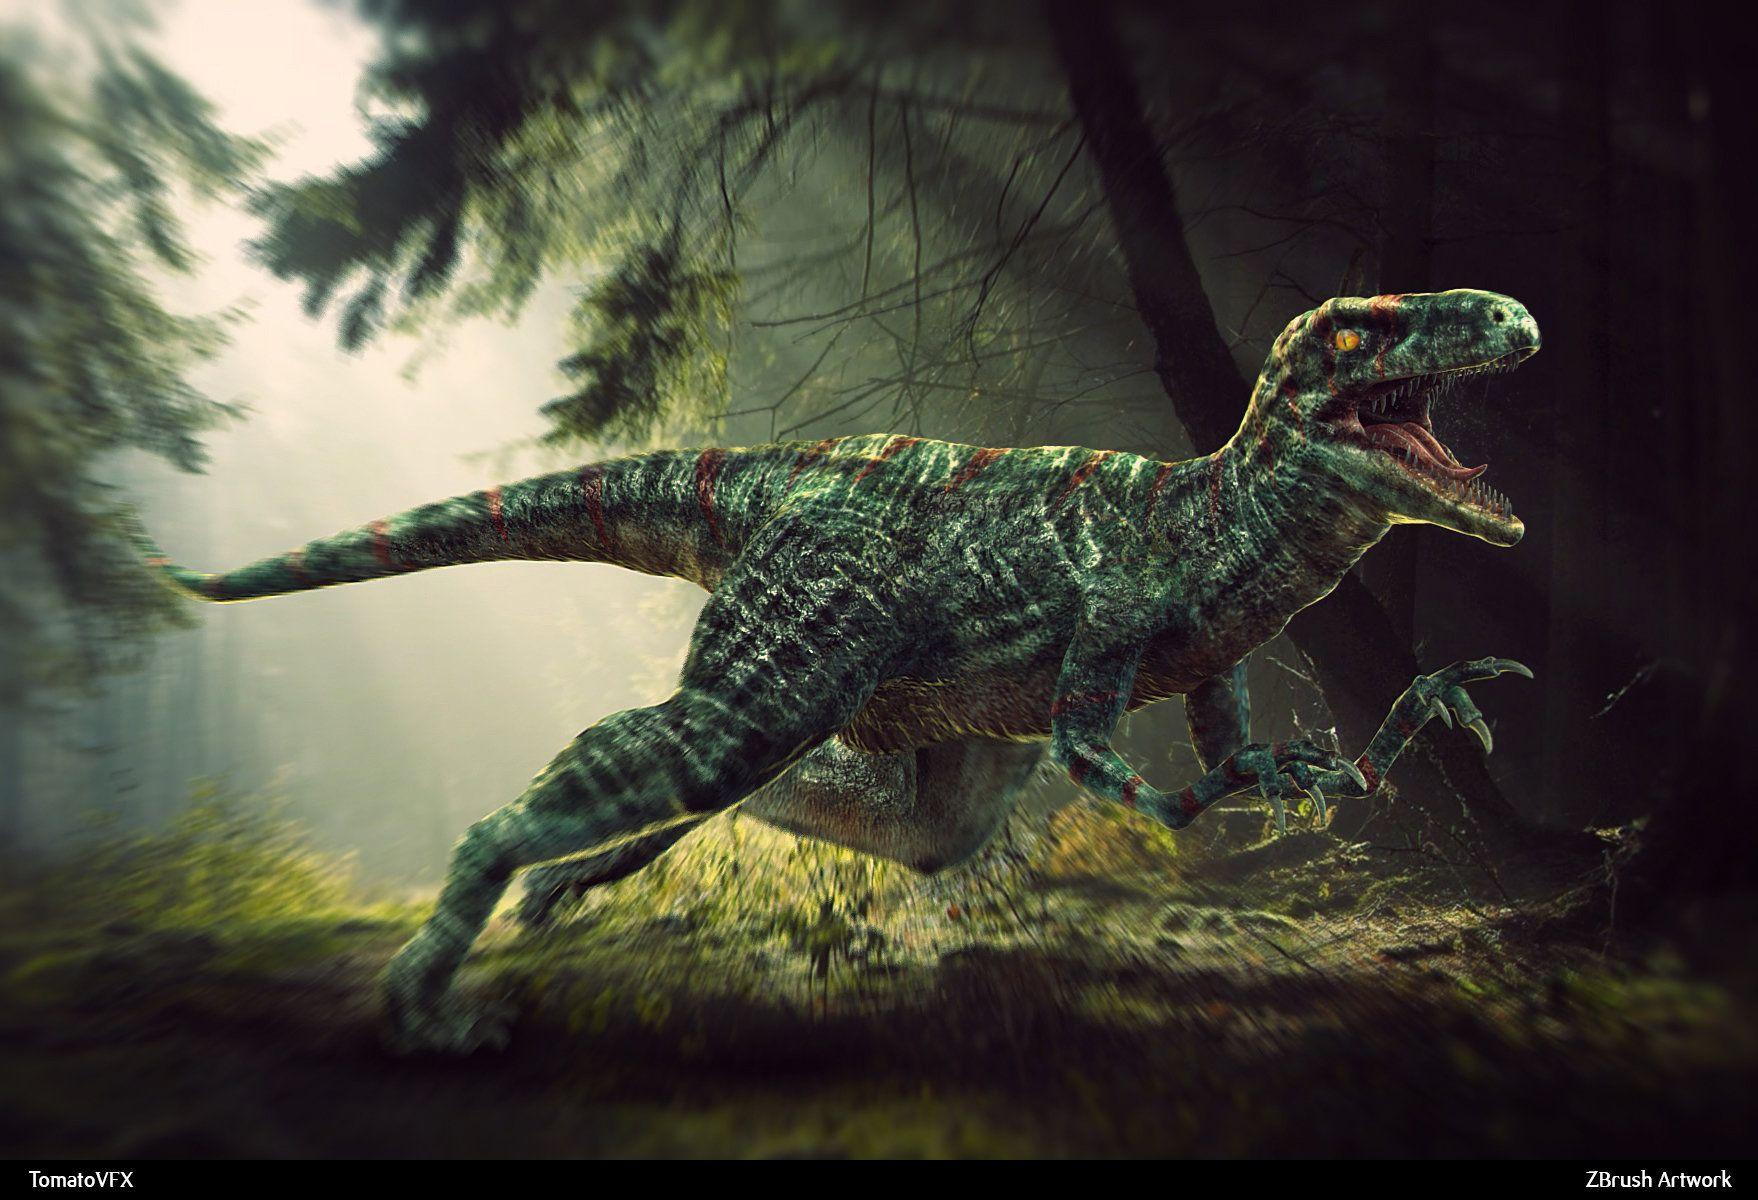 Animales Fondos De Escritorio Hd: Animales Dinosaurio Velociraptor Fondo De Pantalla